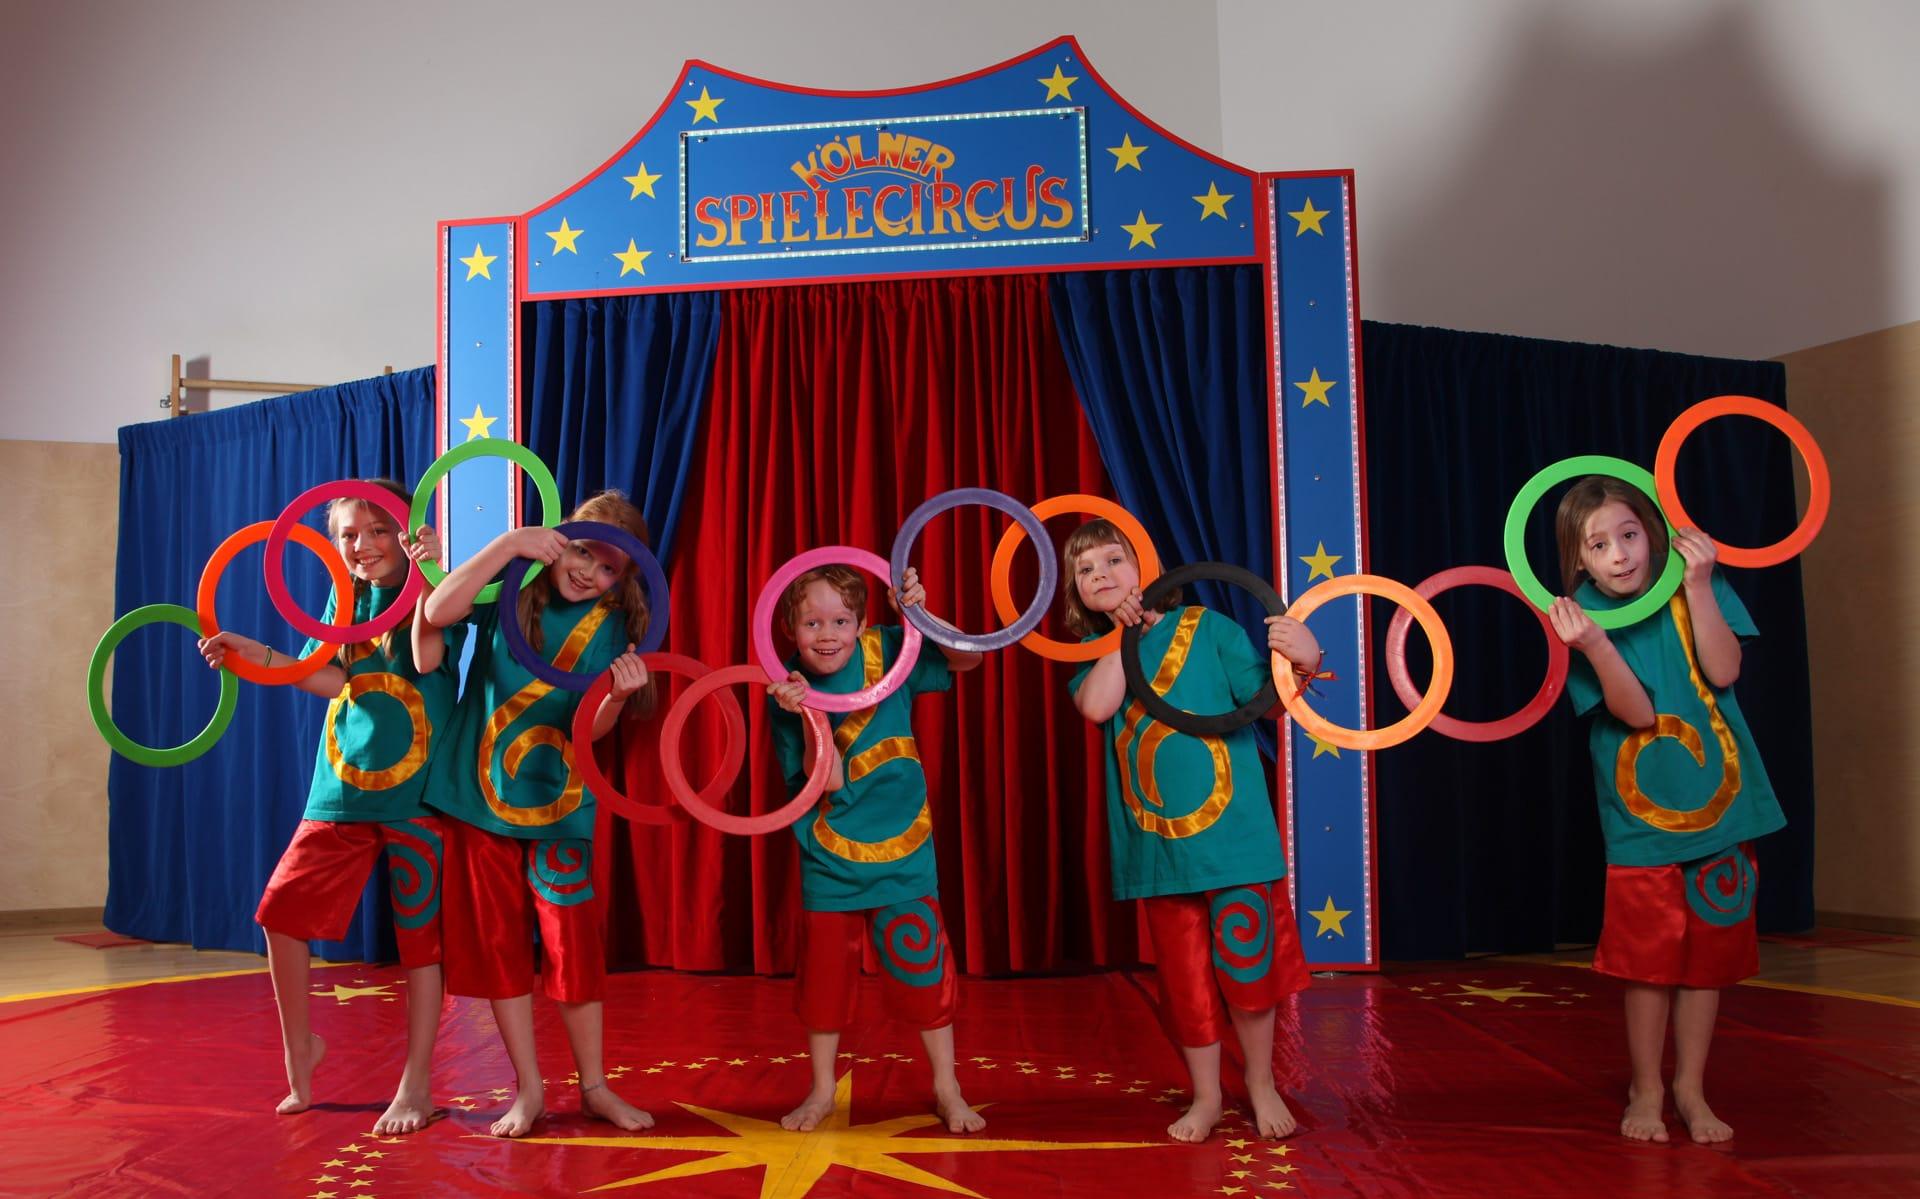 Zirkus Spiele